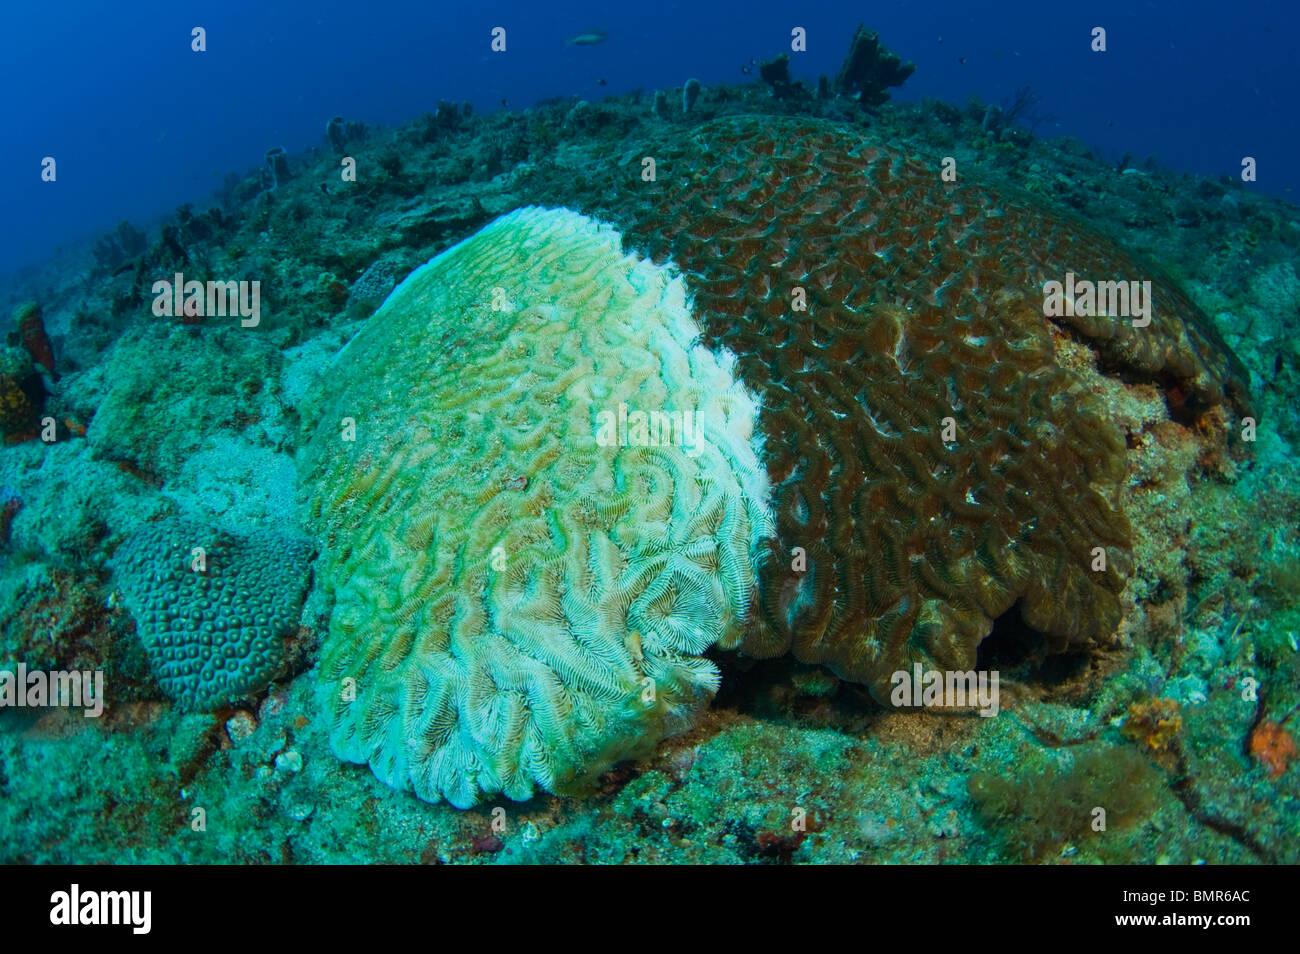 Brain Coral (Diploria strigosa) in Juno Beach, FL suffering from White Plague, a disease that has ravaged reefs - Stock Image